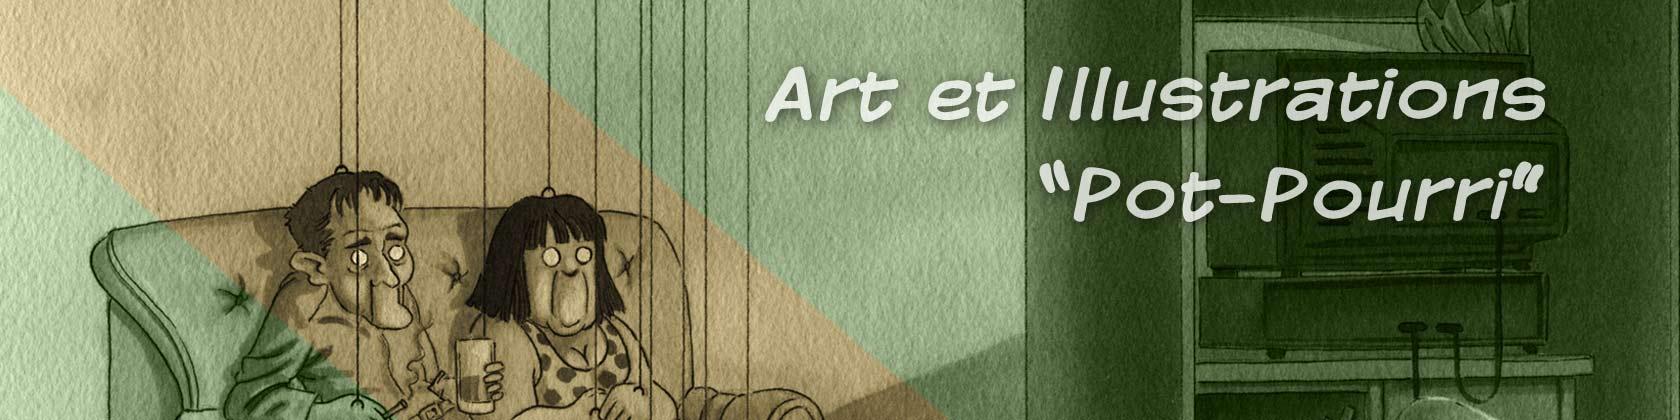 Art - travaux d'illustrations